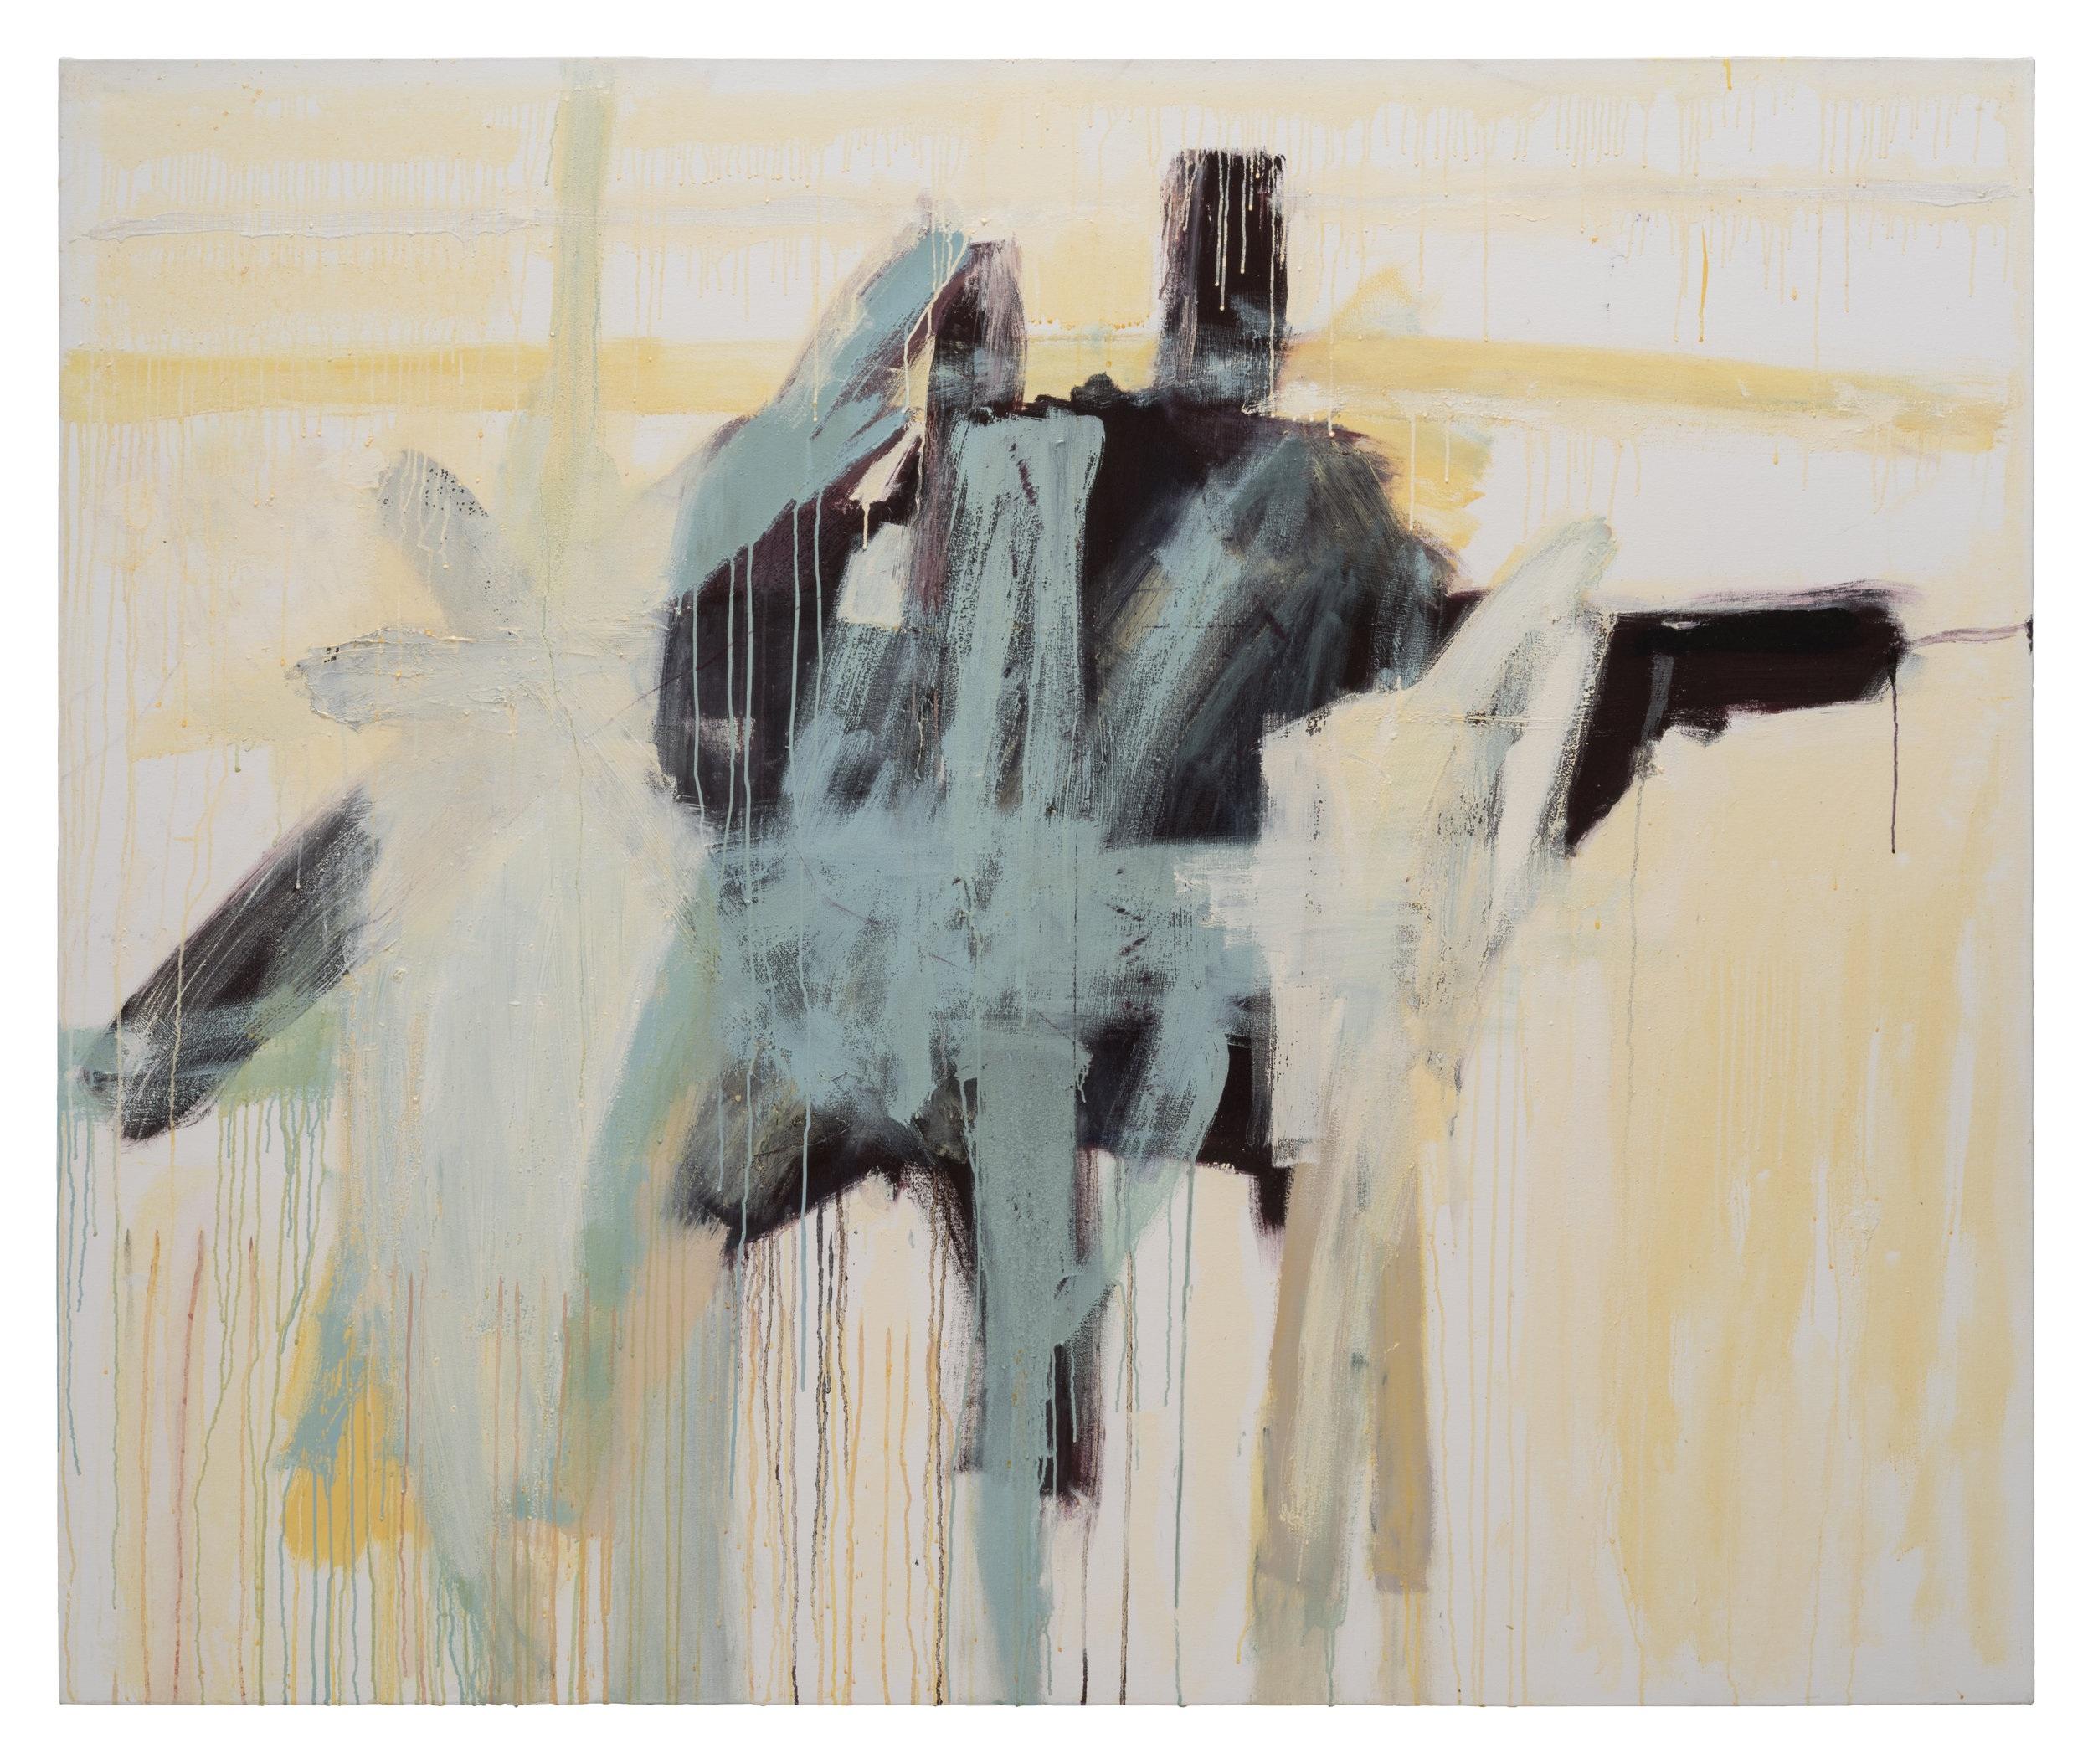 triptych+2%2C+oil+on+canvas%2C+60+x+72+in.jpg